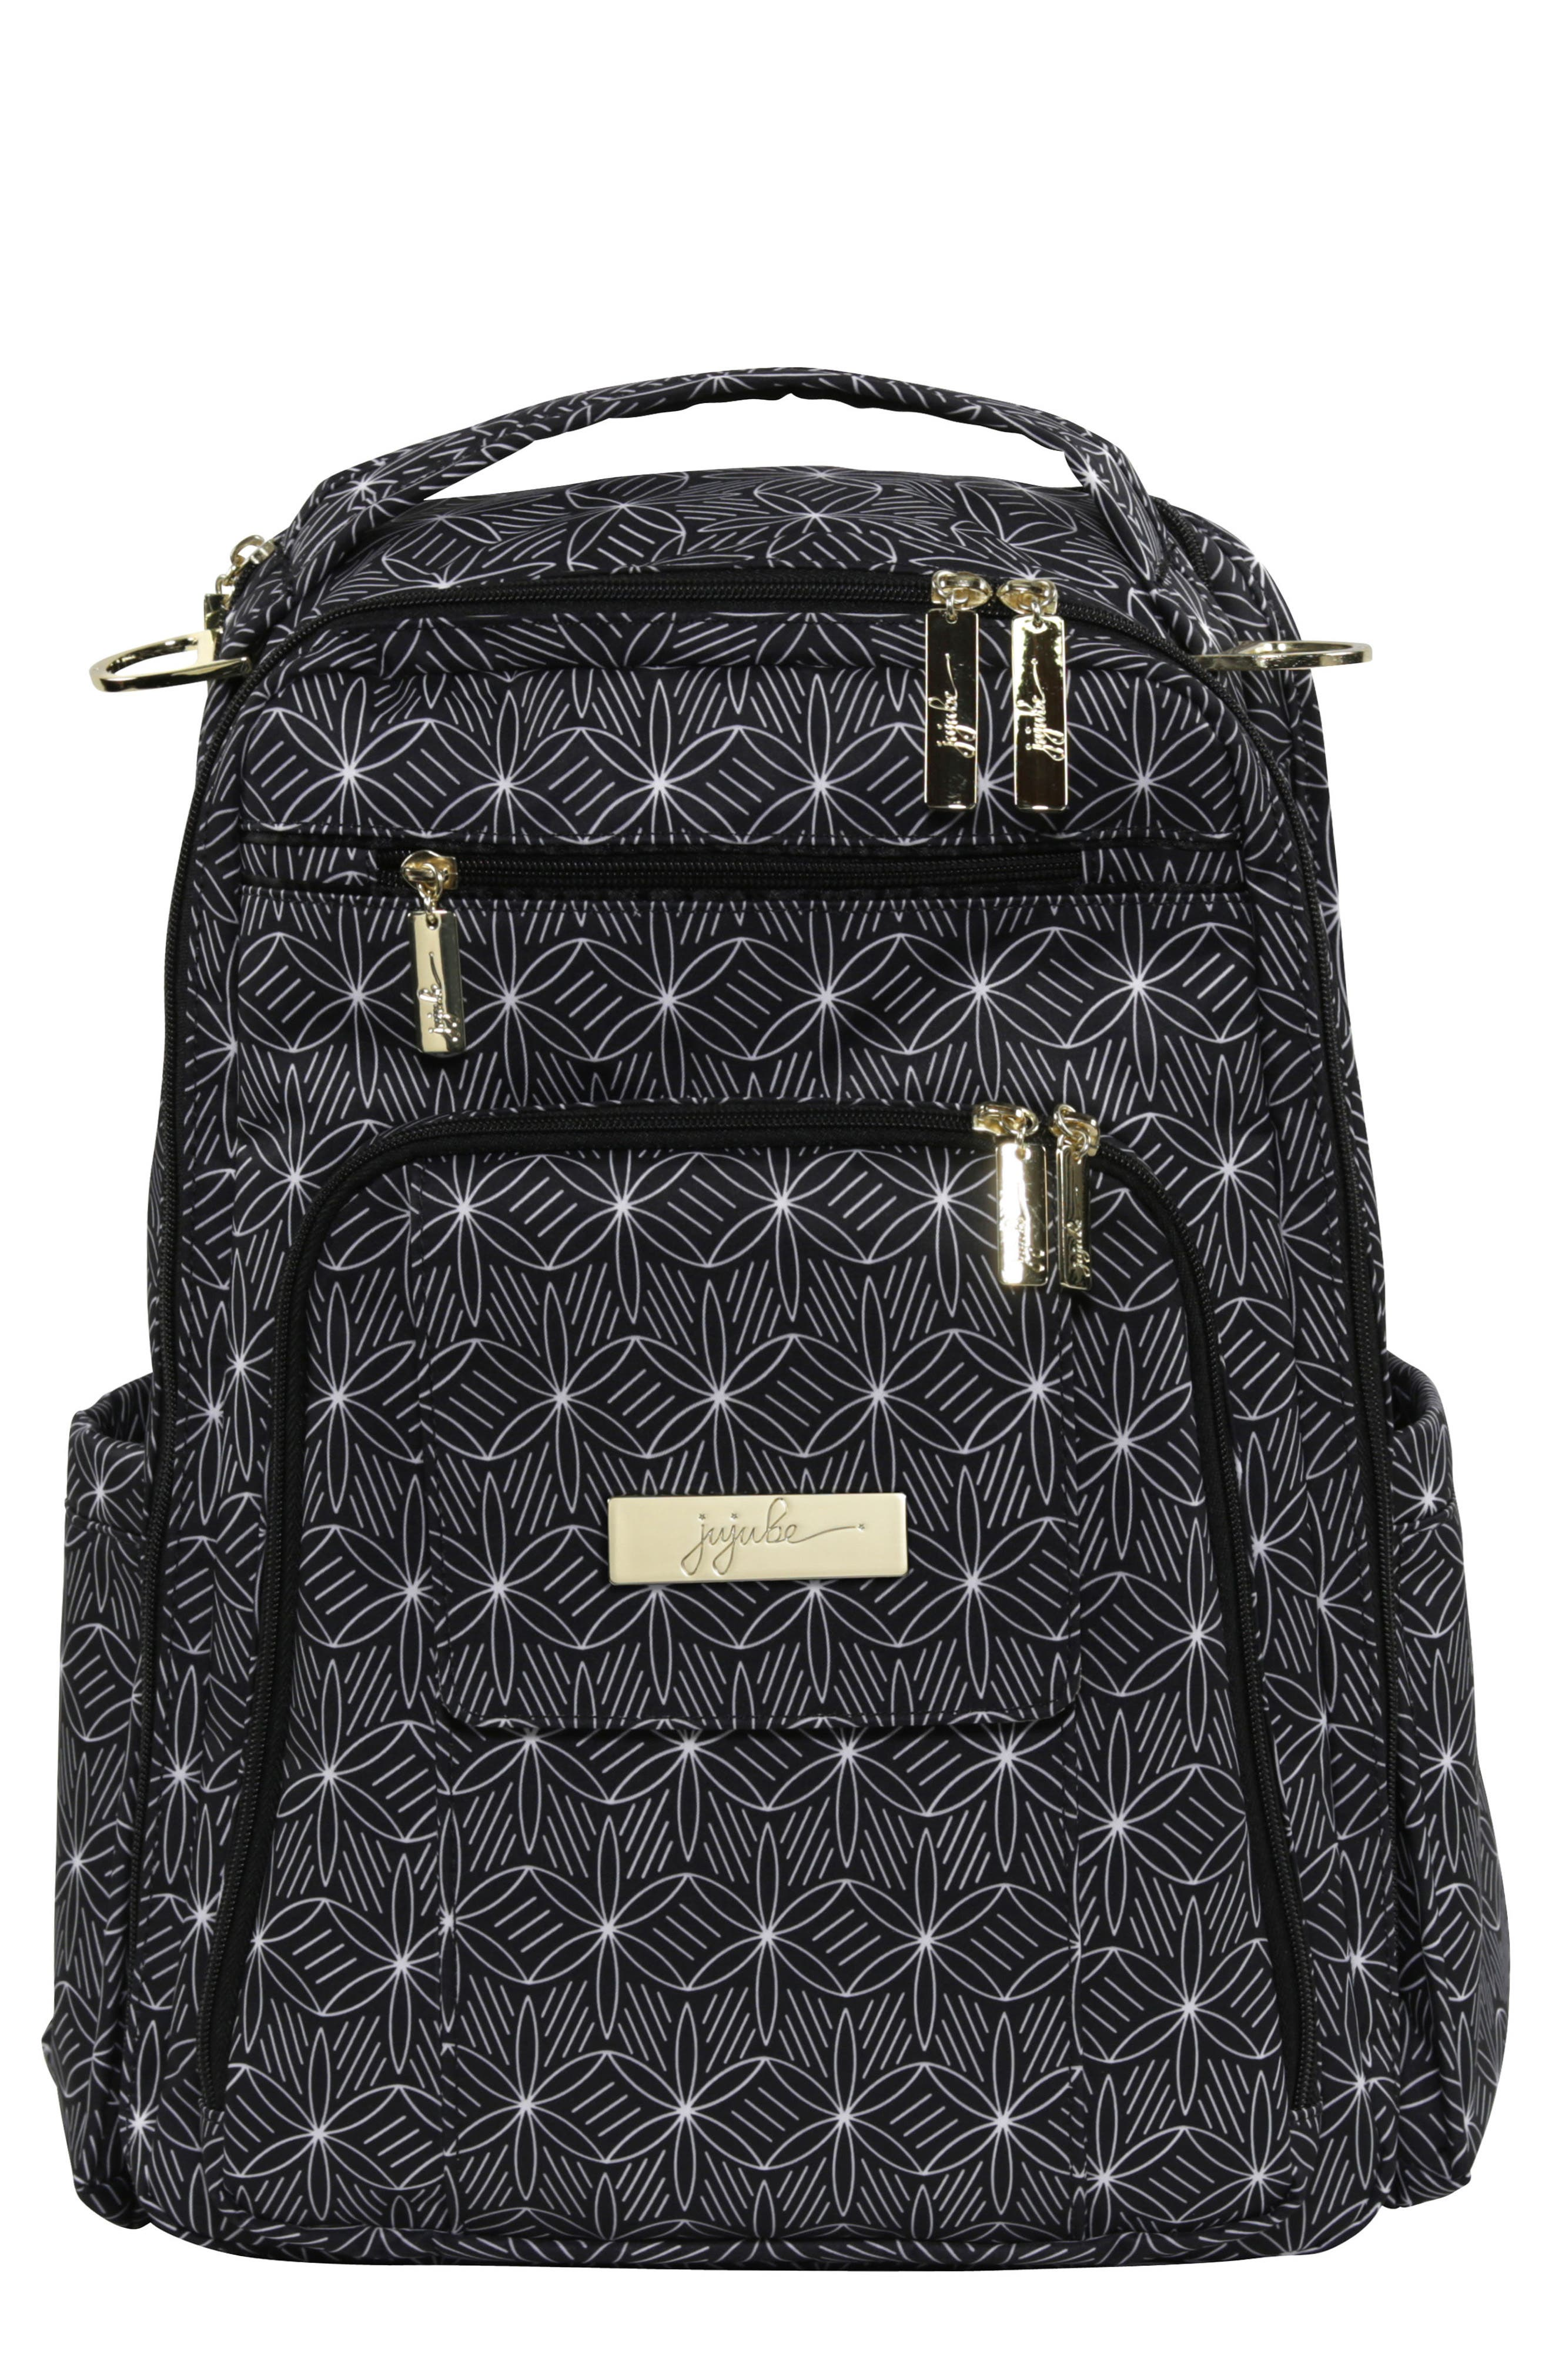 Alternate Image 1 Selected - Ju-Ju-Be 'Legacy - Be Right Back' Diaper Backpack